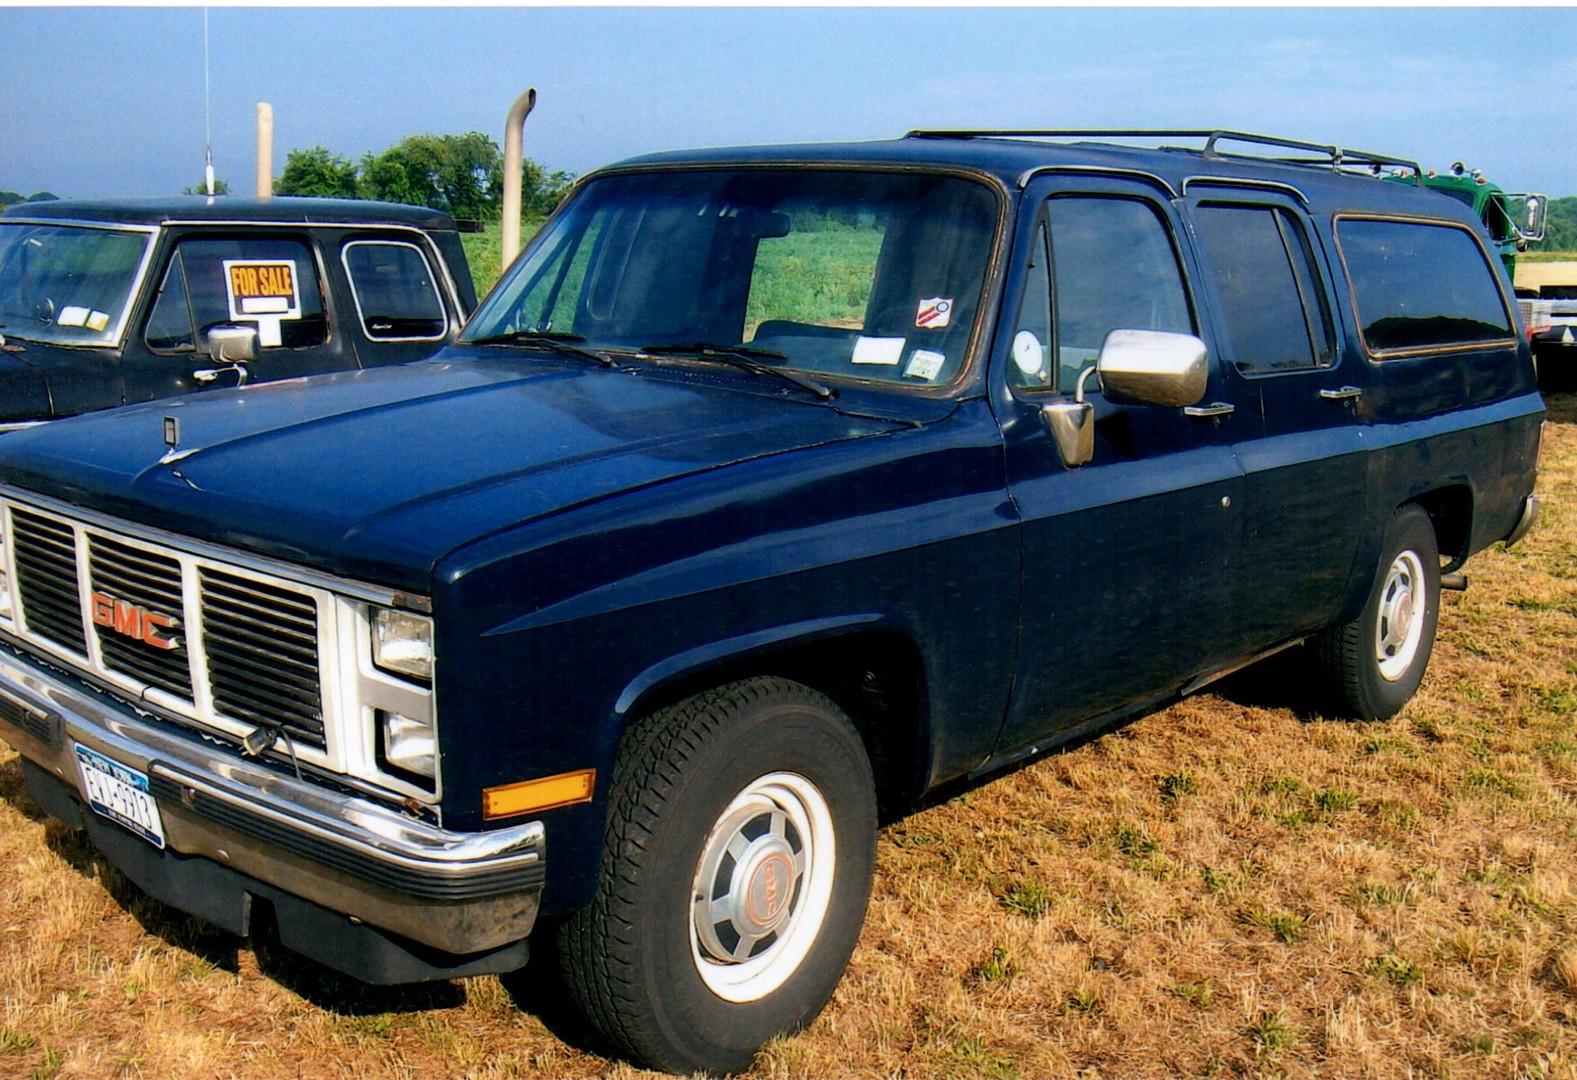 1986 GMC Suburban - Karl Walz Sr.